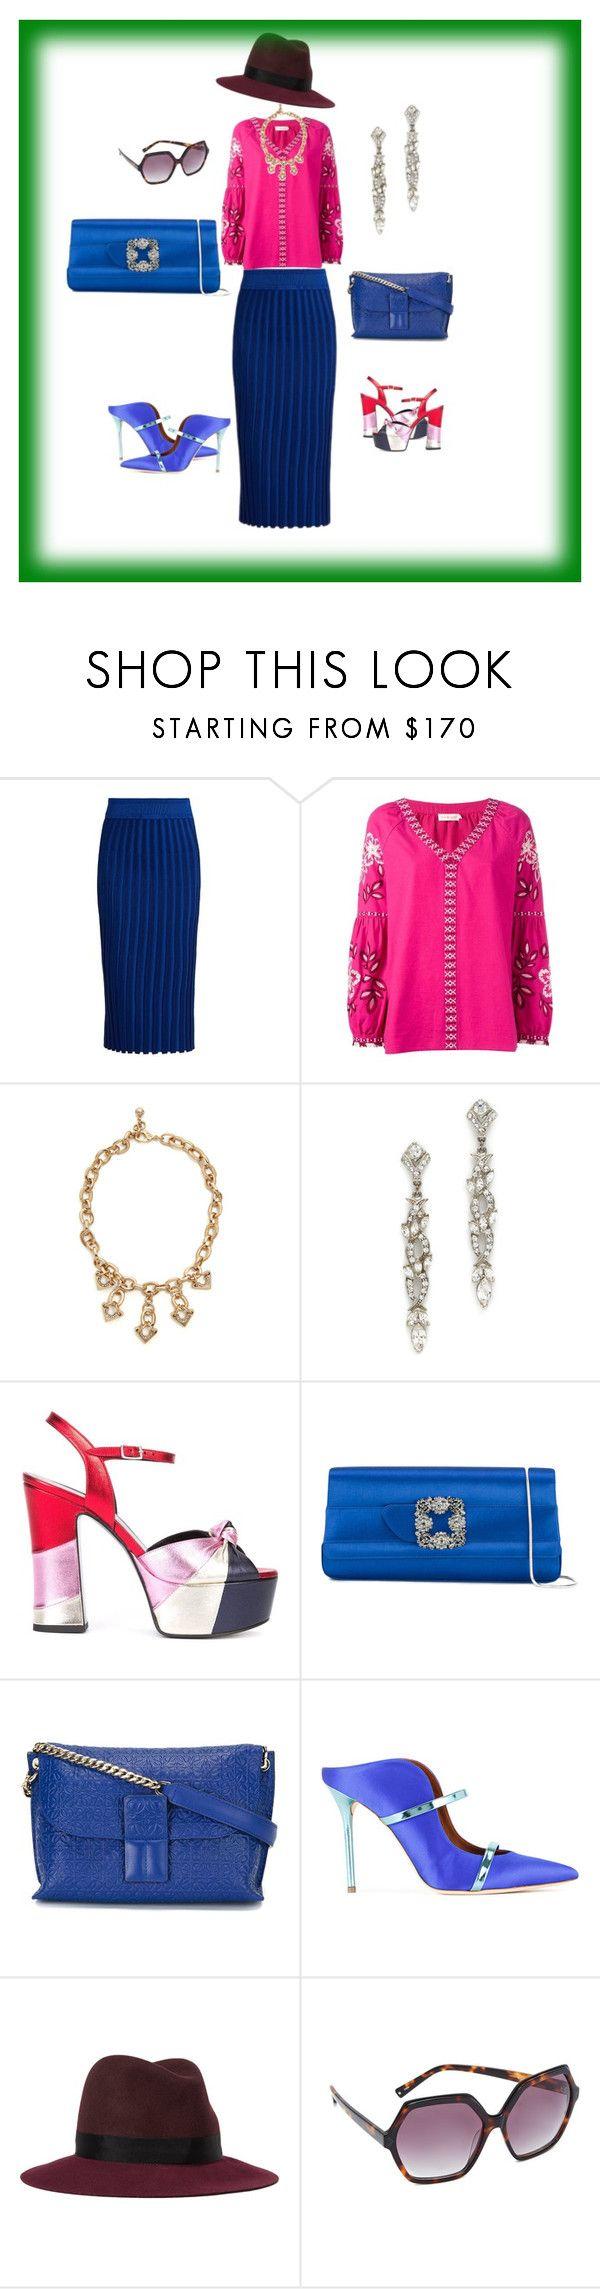 """Pink print...."" by jamuna-kaalla ❤ liked on Polyvore featuring Altuzarra, Tory Burch, Lulu Frost, Ben-Amun, Yves Saint Laurent, Manolo Blahnik, Loewe, Malone Souliers, rag & bone and Kendall + Kylie"